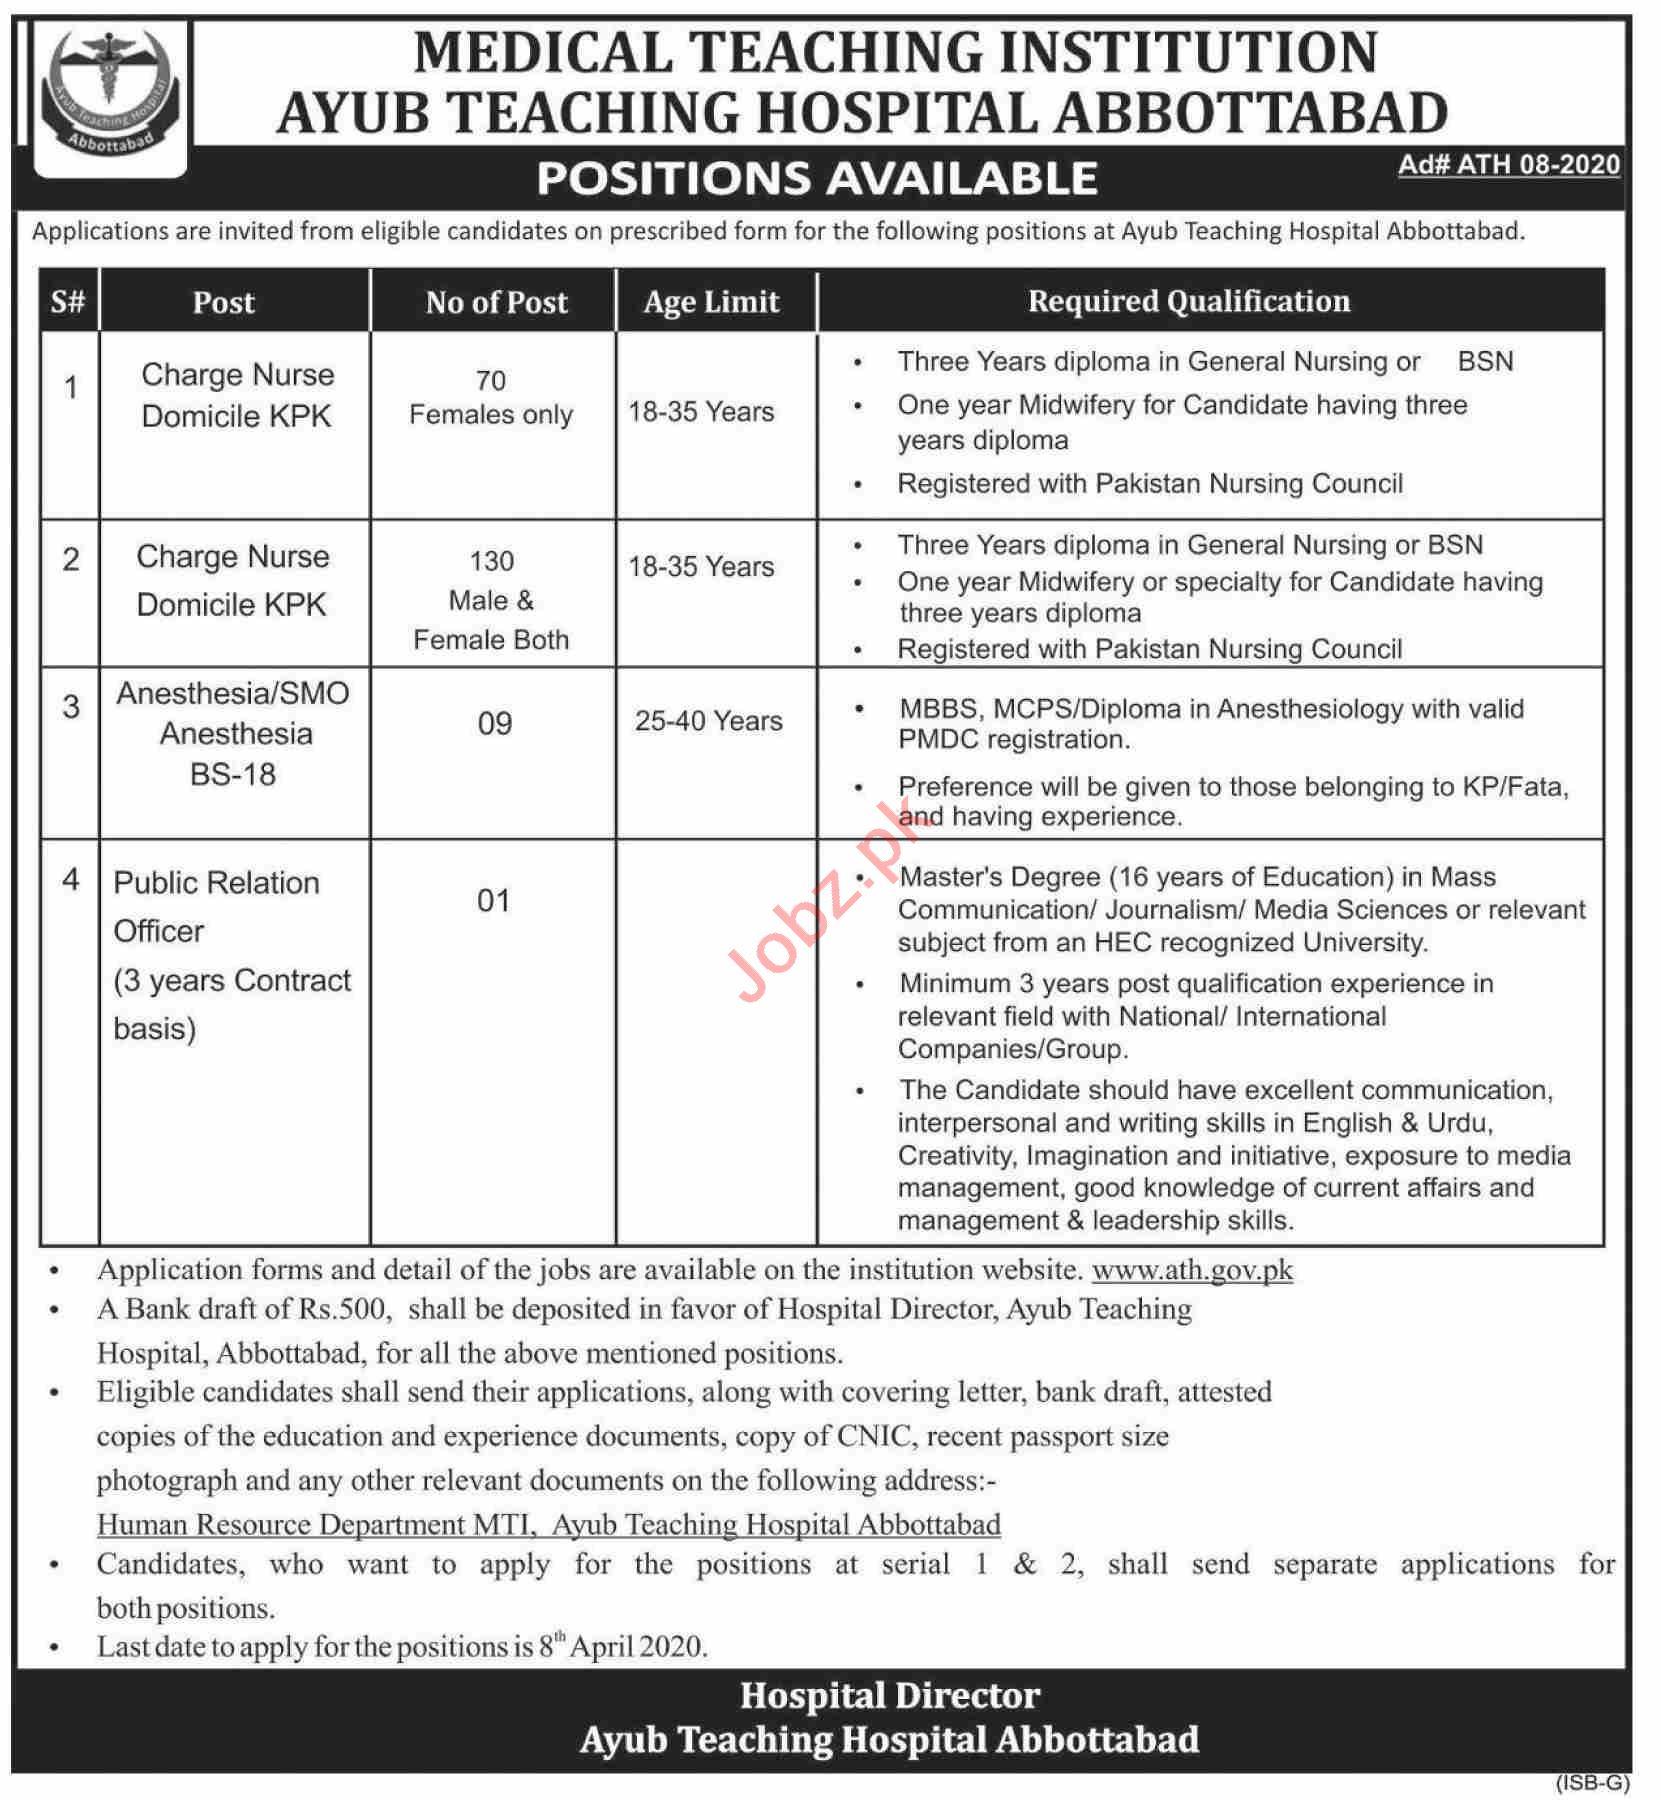 Ayub Teaching Hospital ATH Abbottabad Jobs 2020 for Nurses